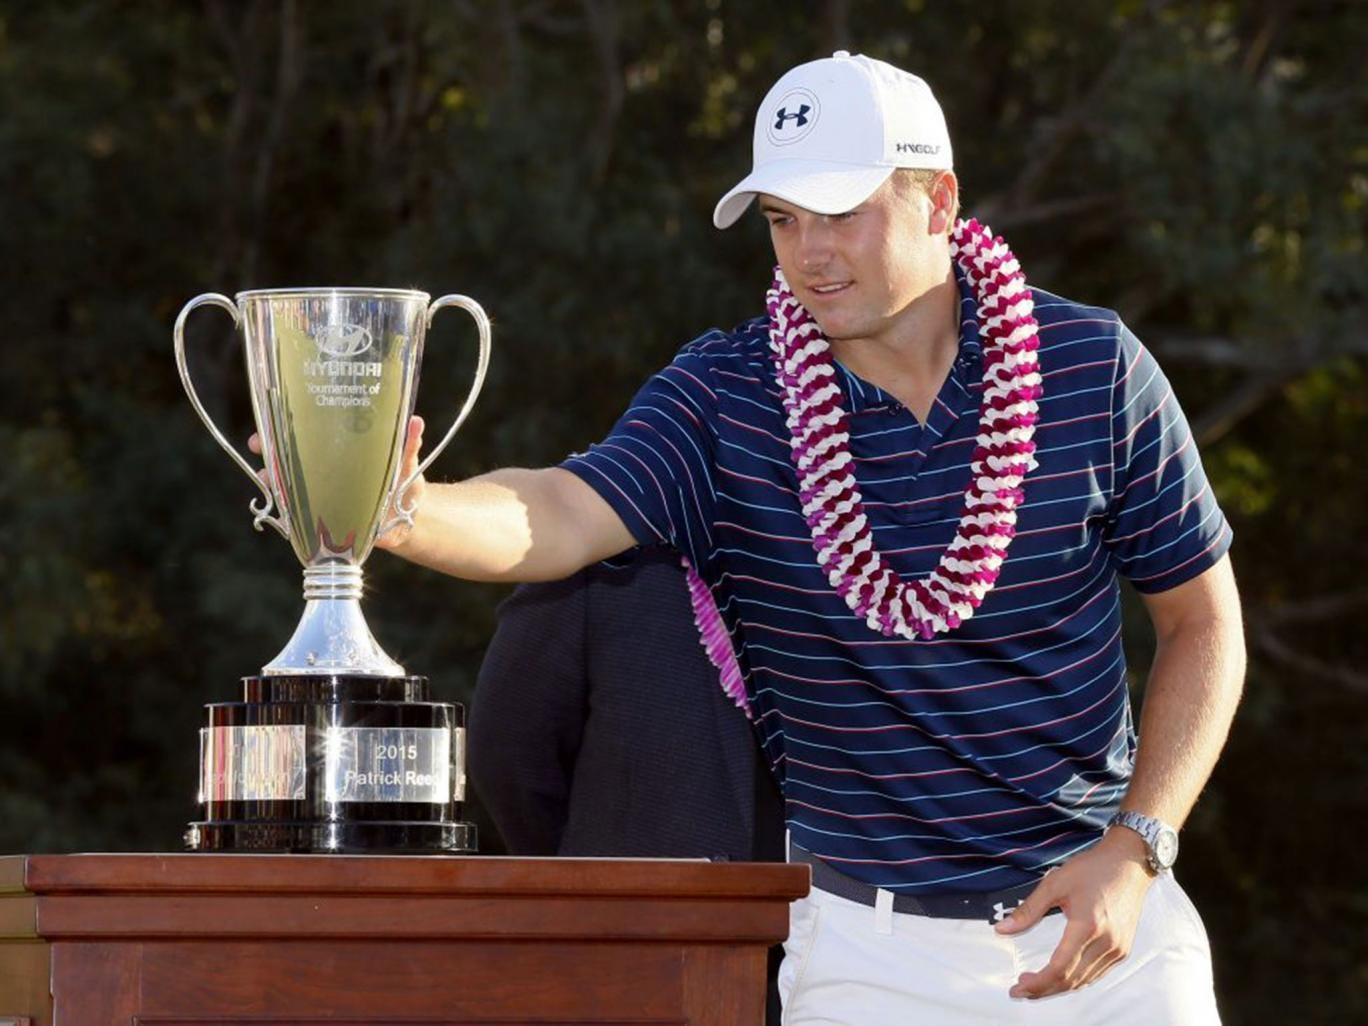 Jordan Spieth: World No. 1 matches Tiger Woods' record